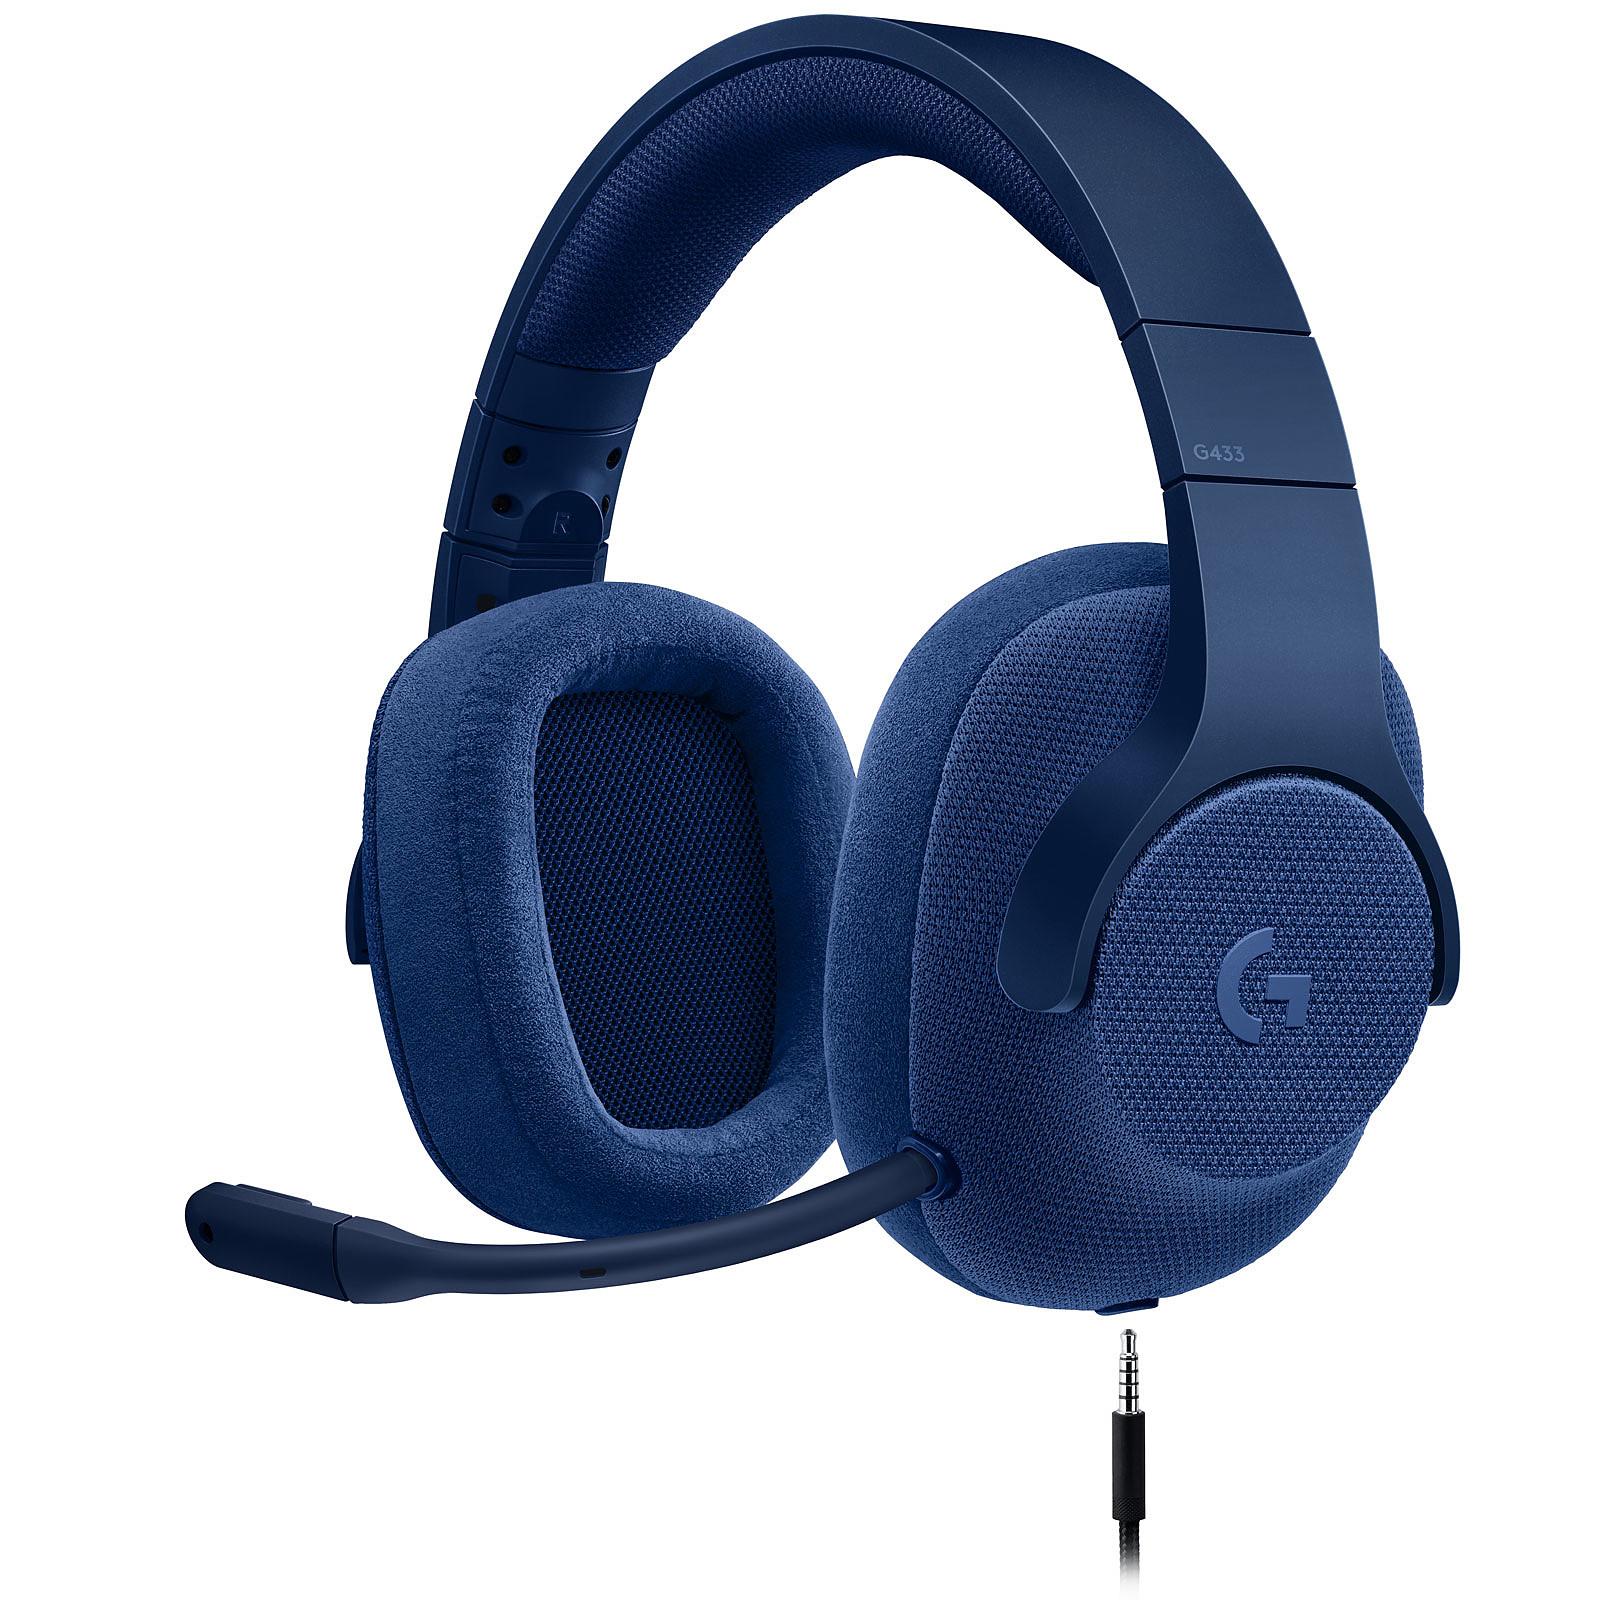 Logitech G433 7.1 Surround Sound Wired Gaming Headset Bleu